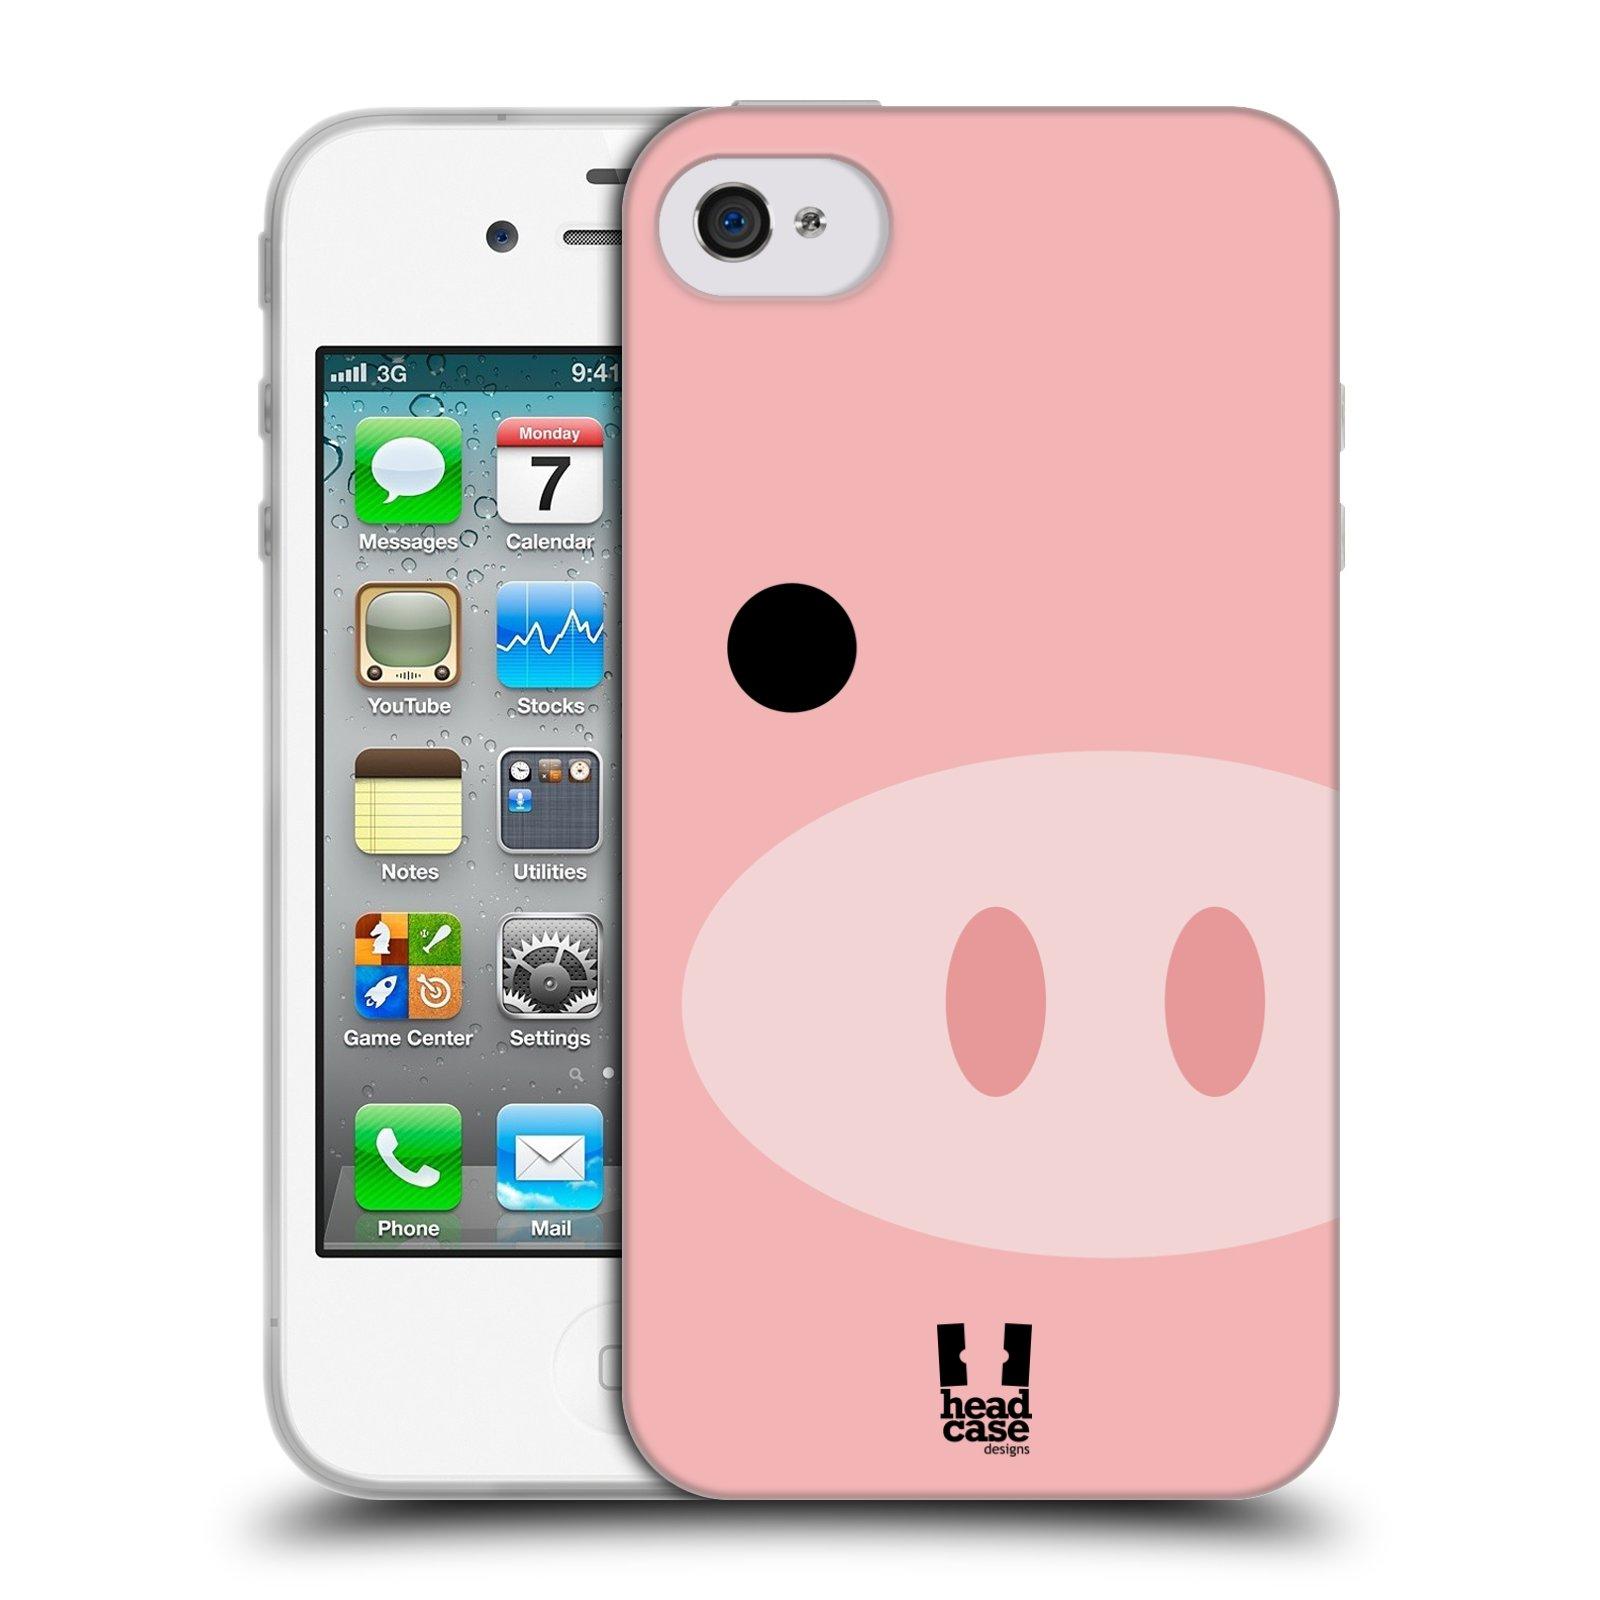 HEAD CASE silikonový obal na mobil Apple Iphone 4/4S vzor Celá tvář zvíře kreslený portrét prasátko